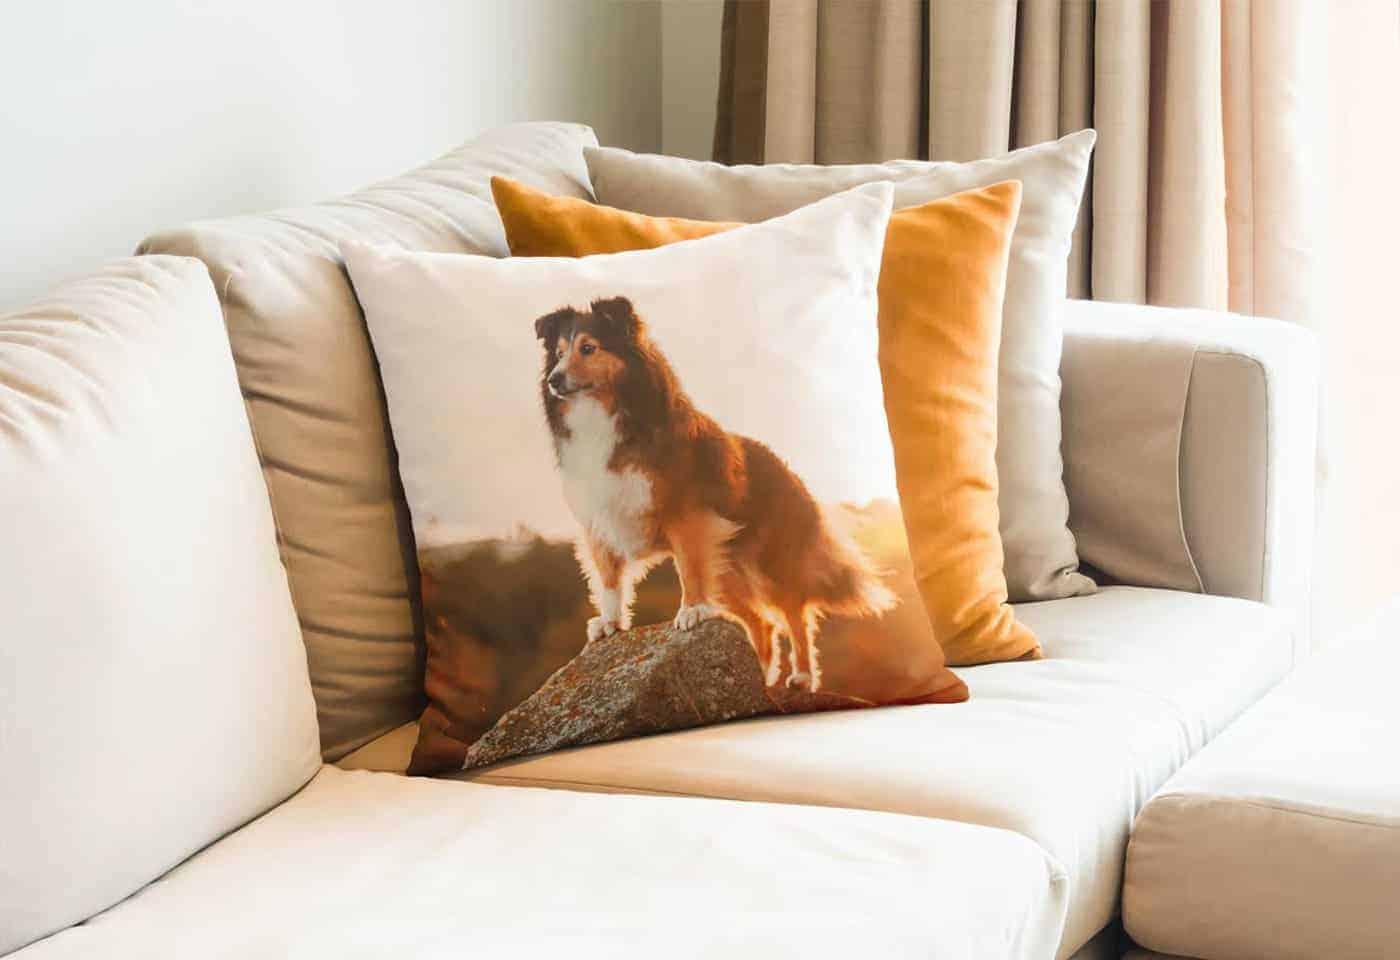 CanvasPop throw pillows sample